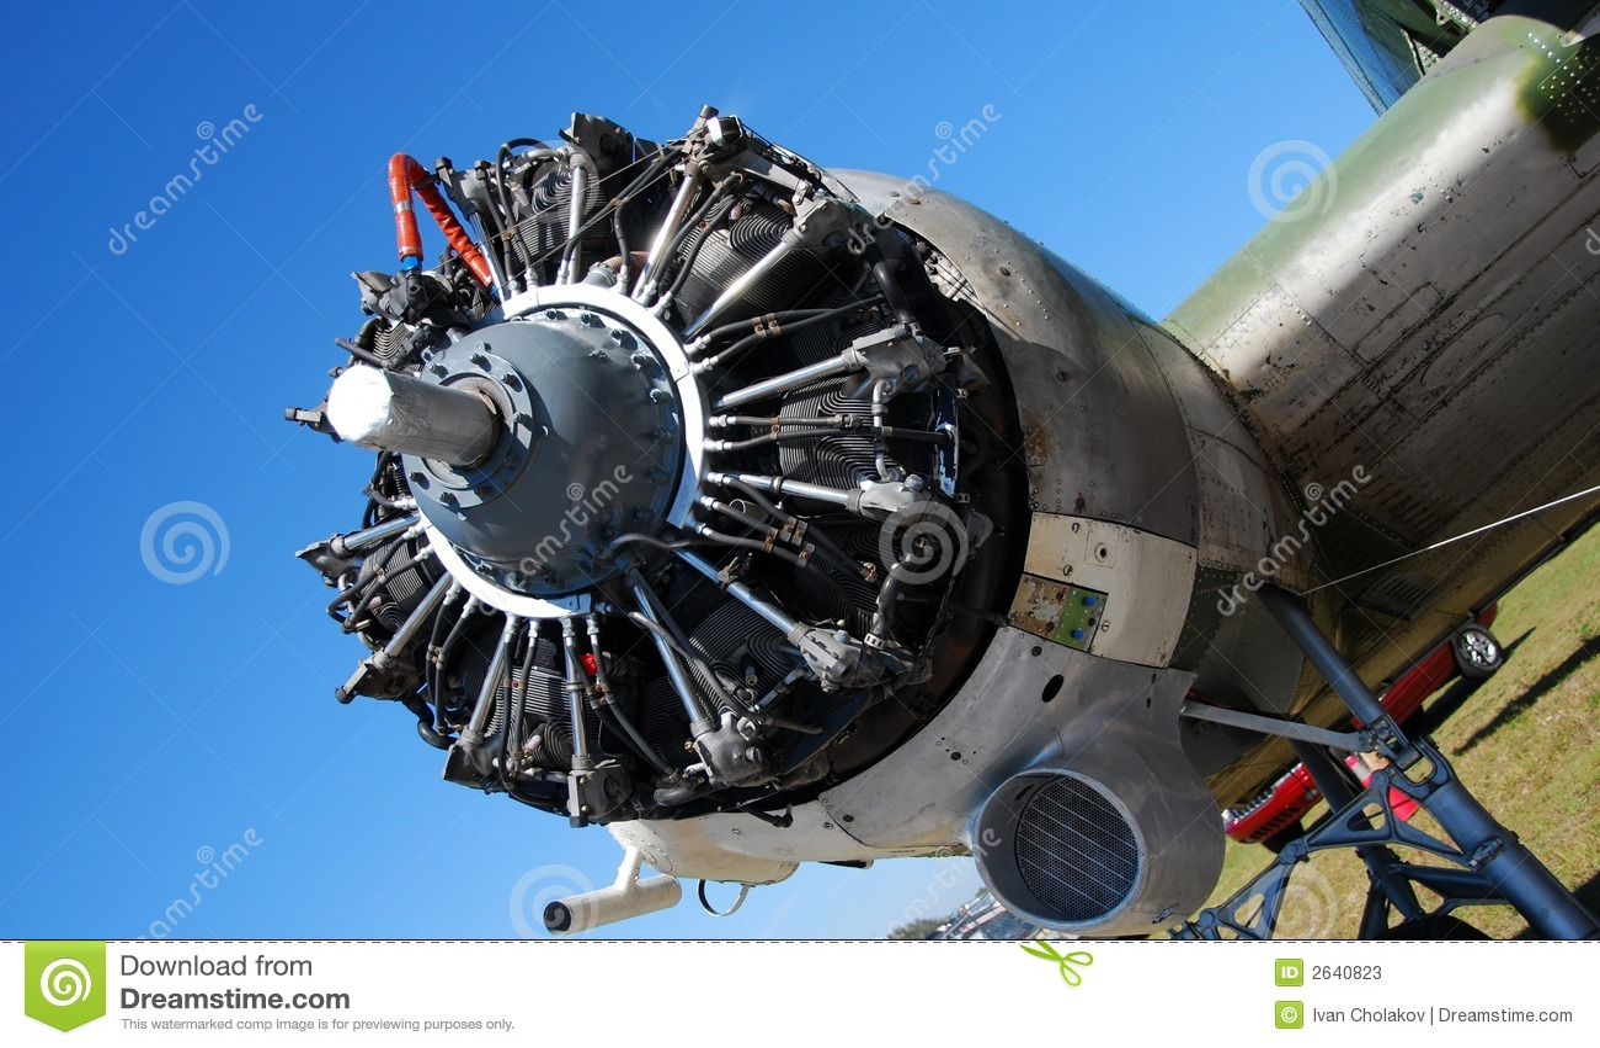 Vintage Aircraft Engines 43